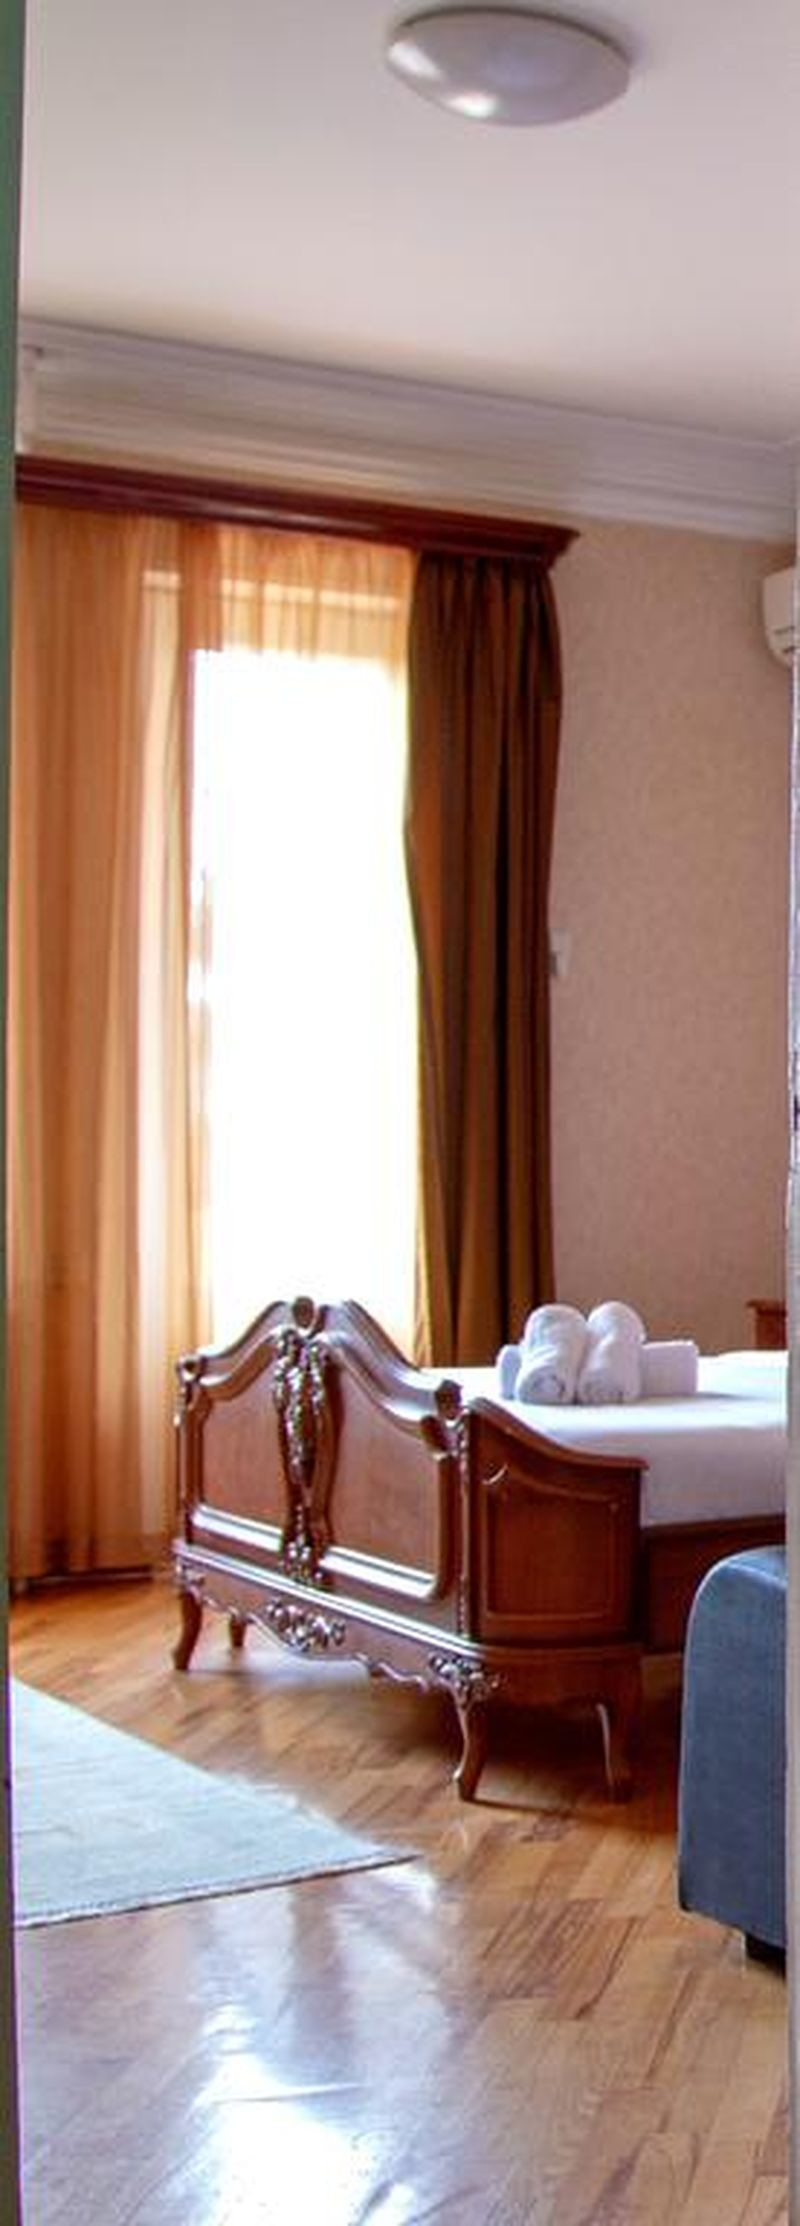 Hotel Satori - 10.jpg